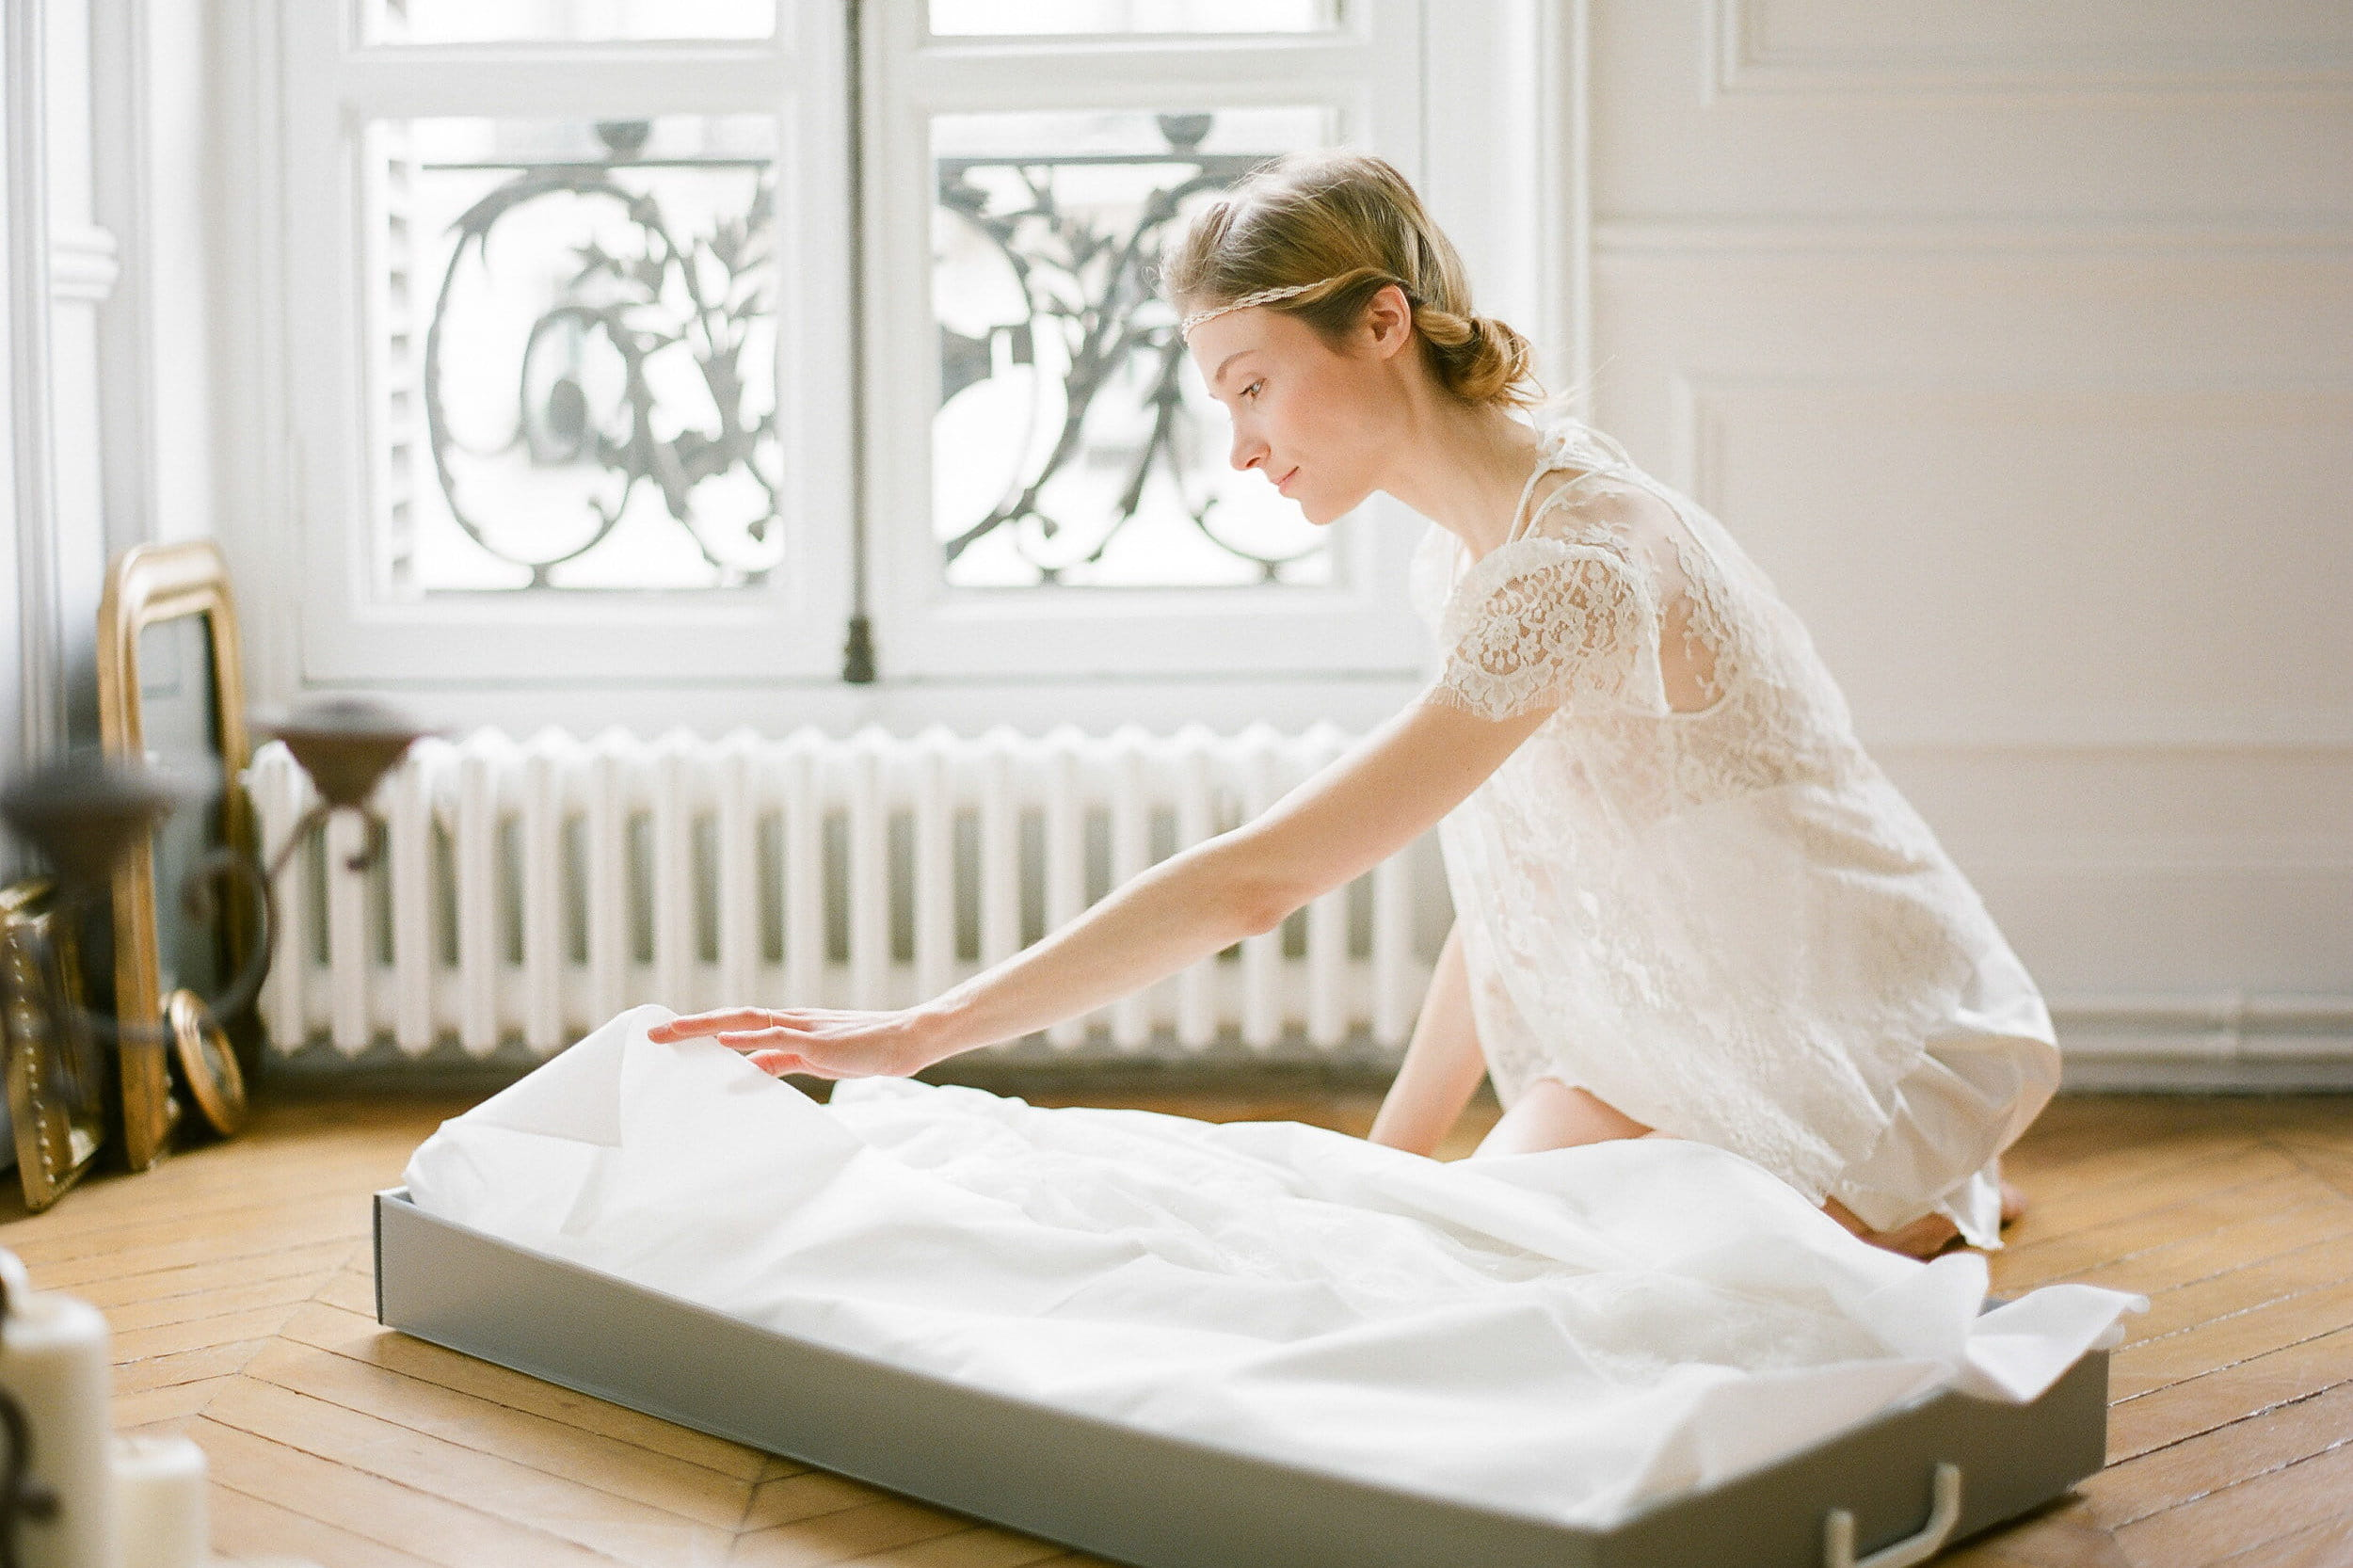 Comment conserver sa robe de mari e journal des femmes for Dallas de conservation de robe de mariage